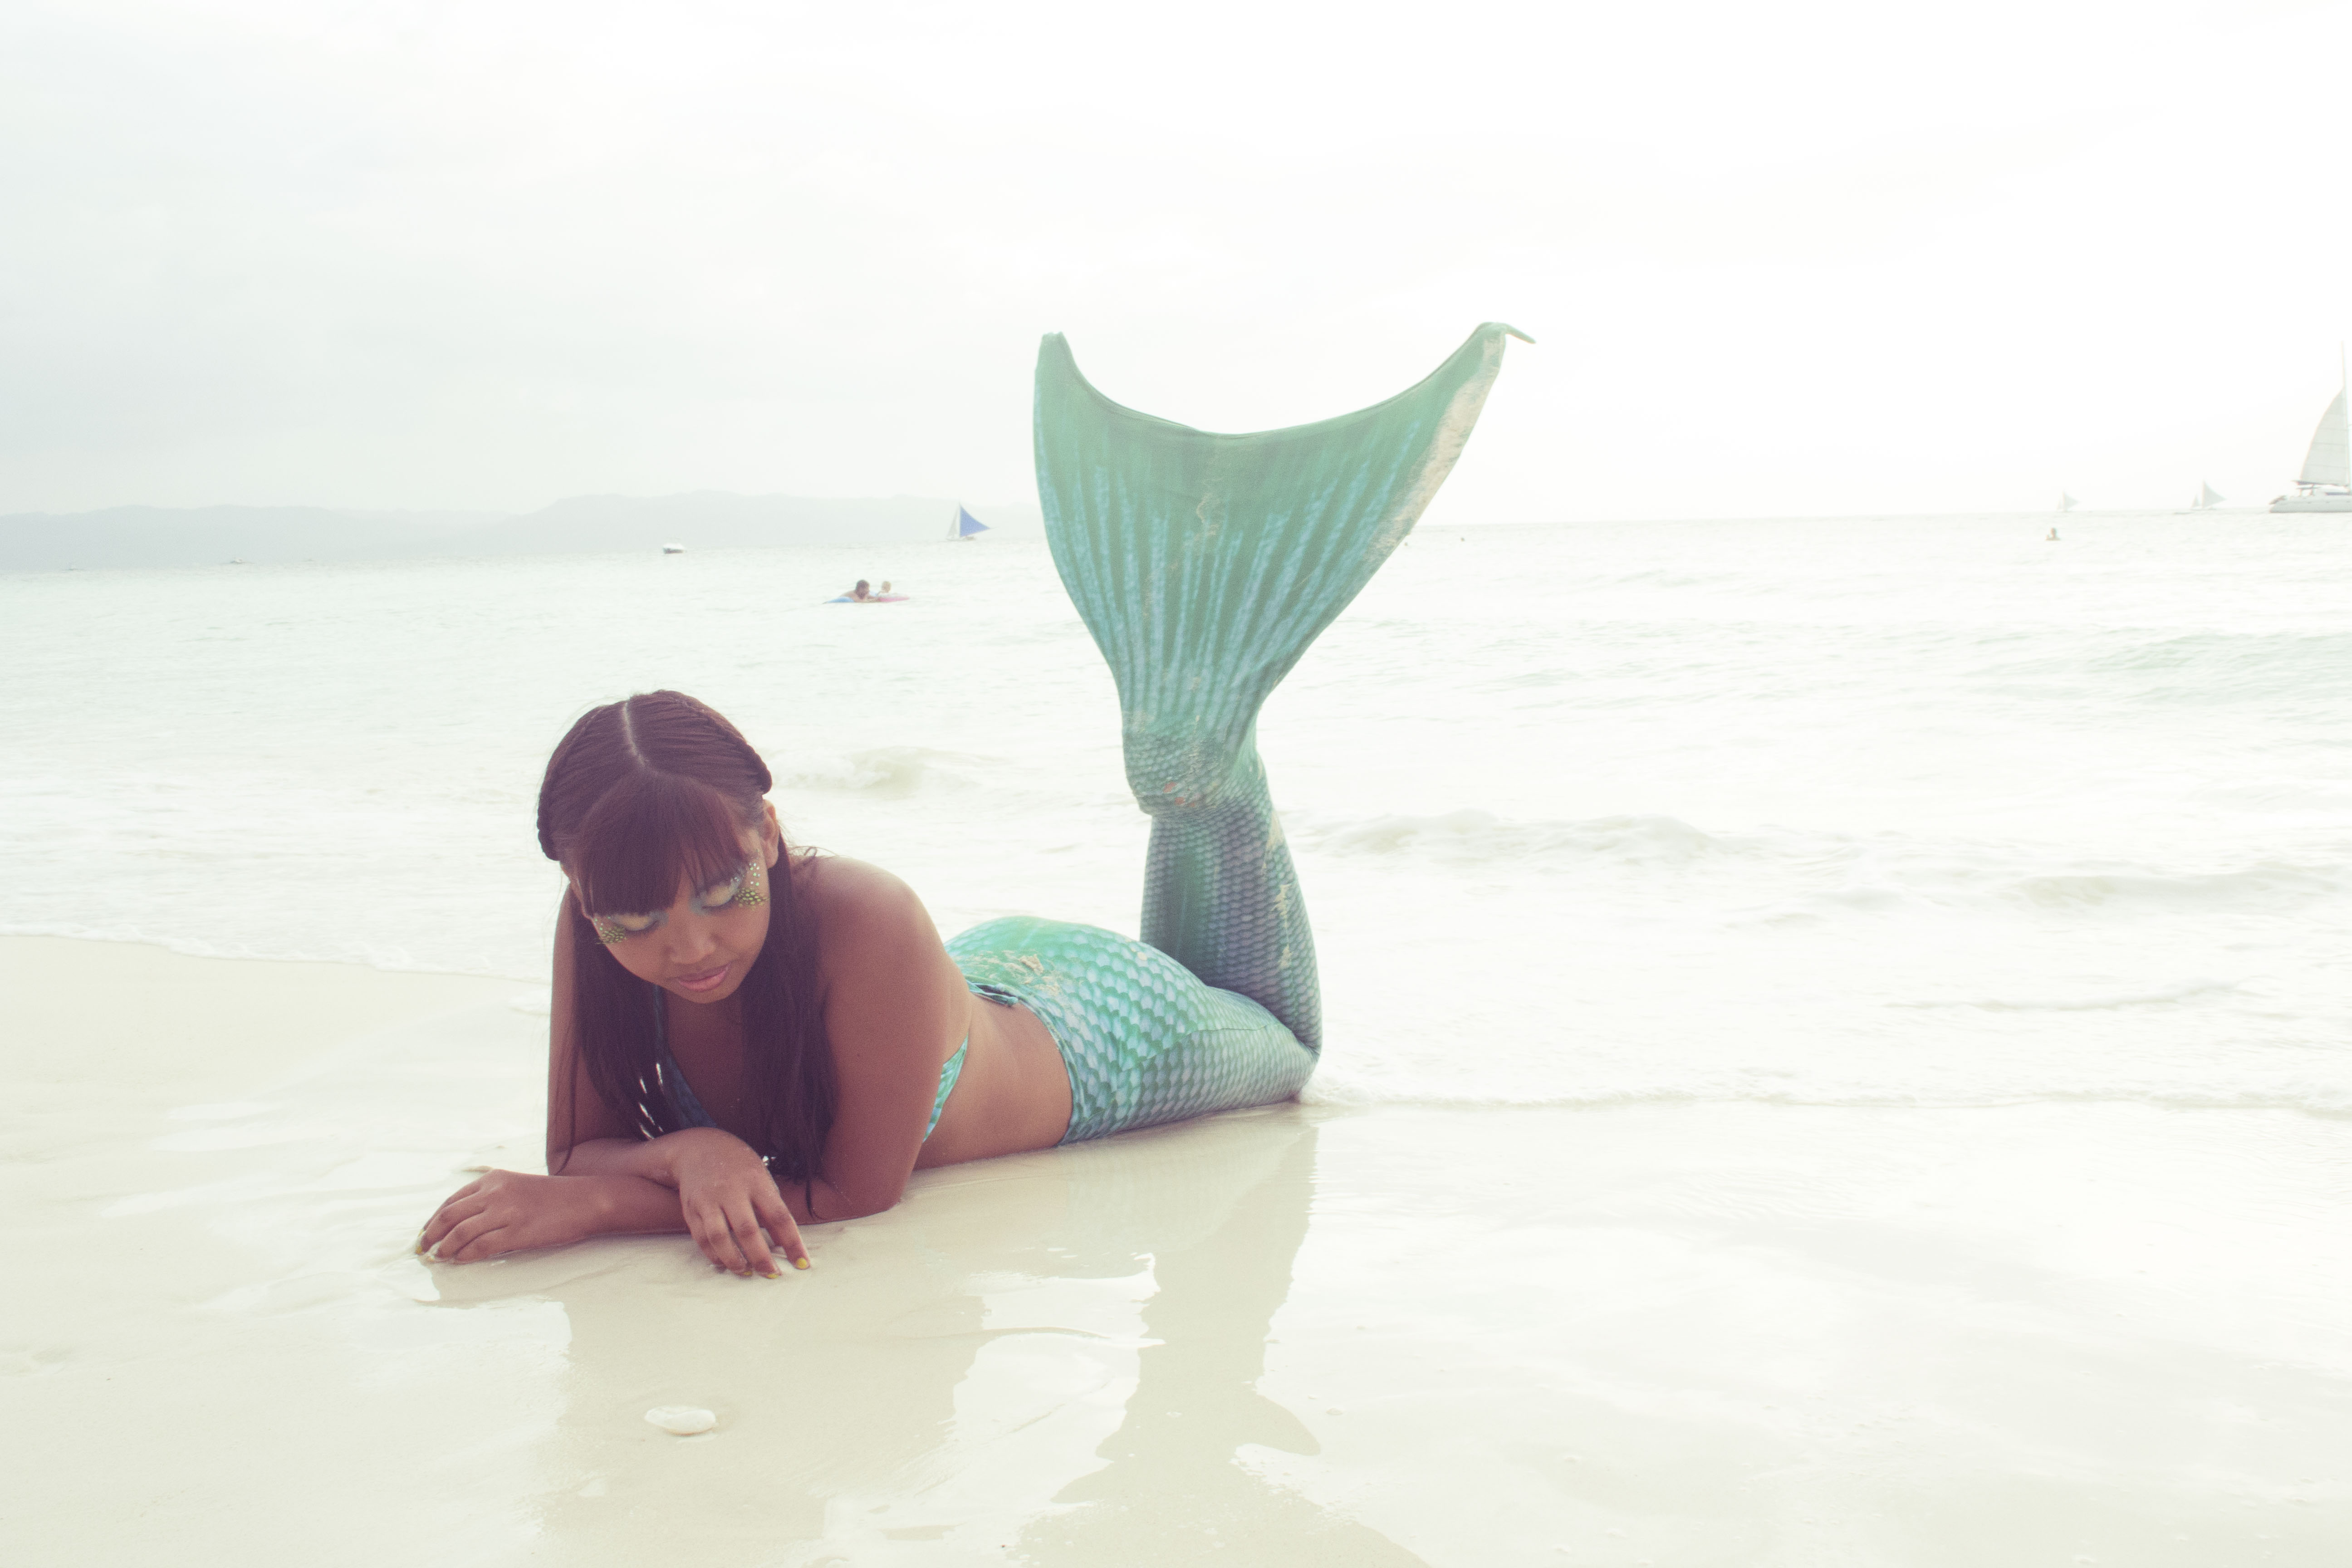 Mermaid Makeover, Boracay island, Philippines - Jusz Travel